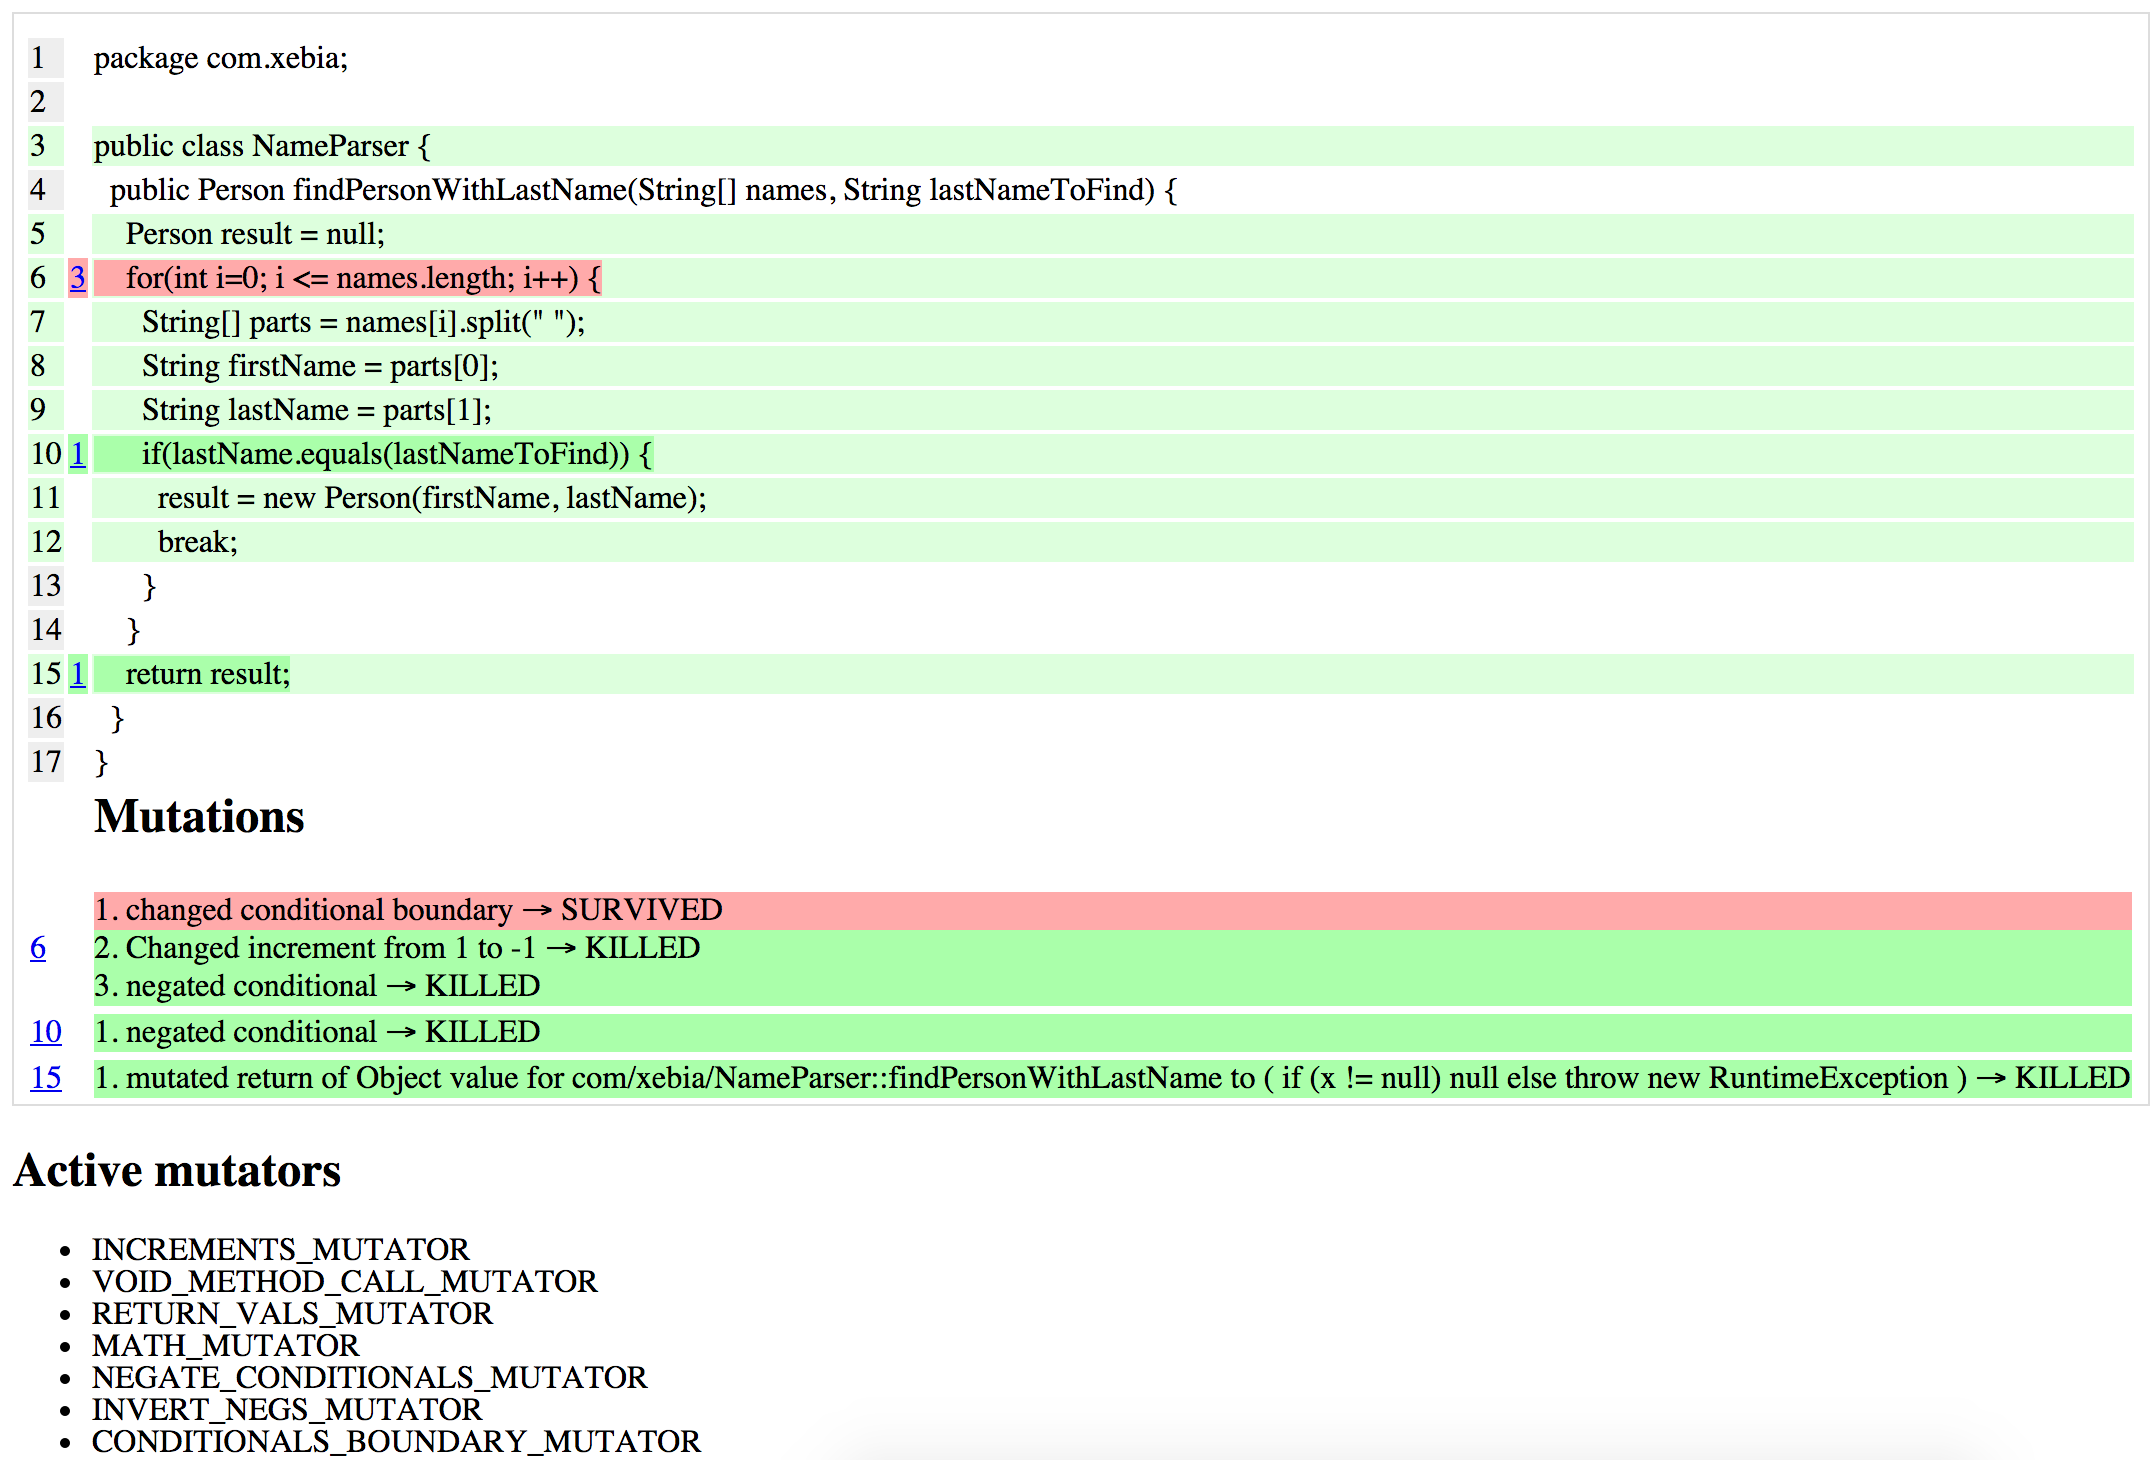 NameParser mutation testing results